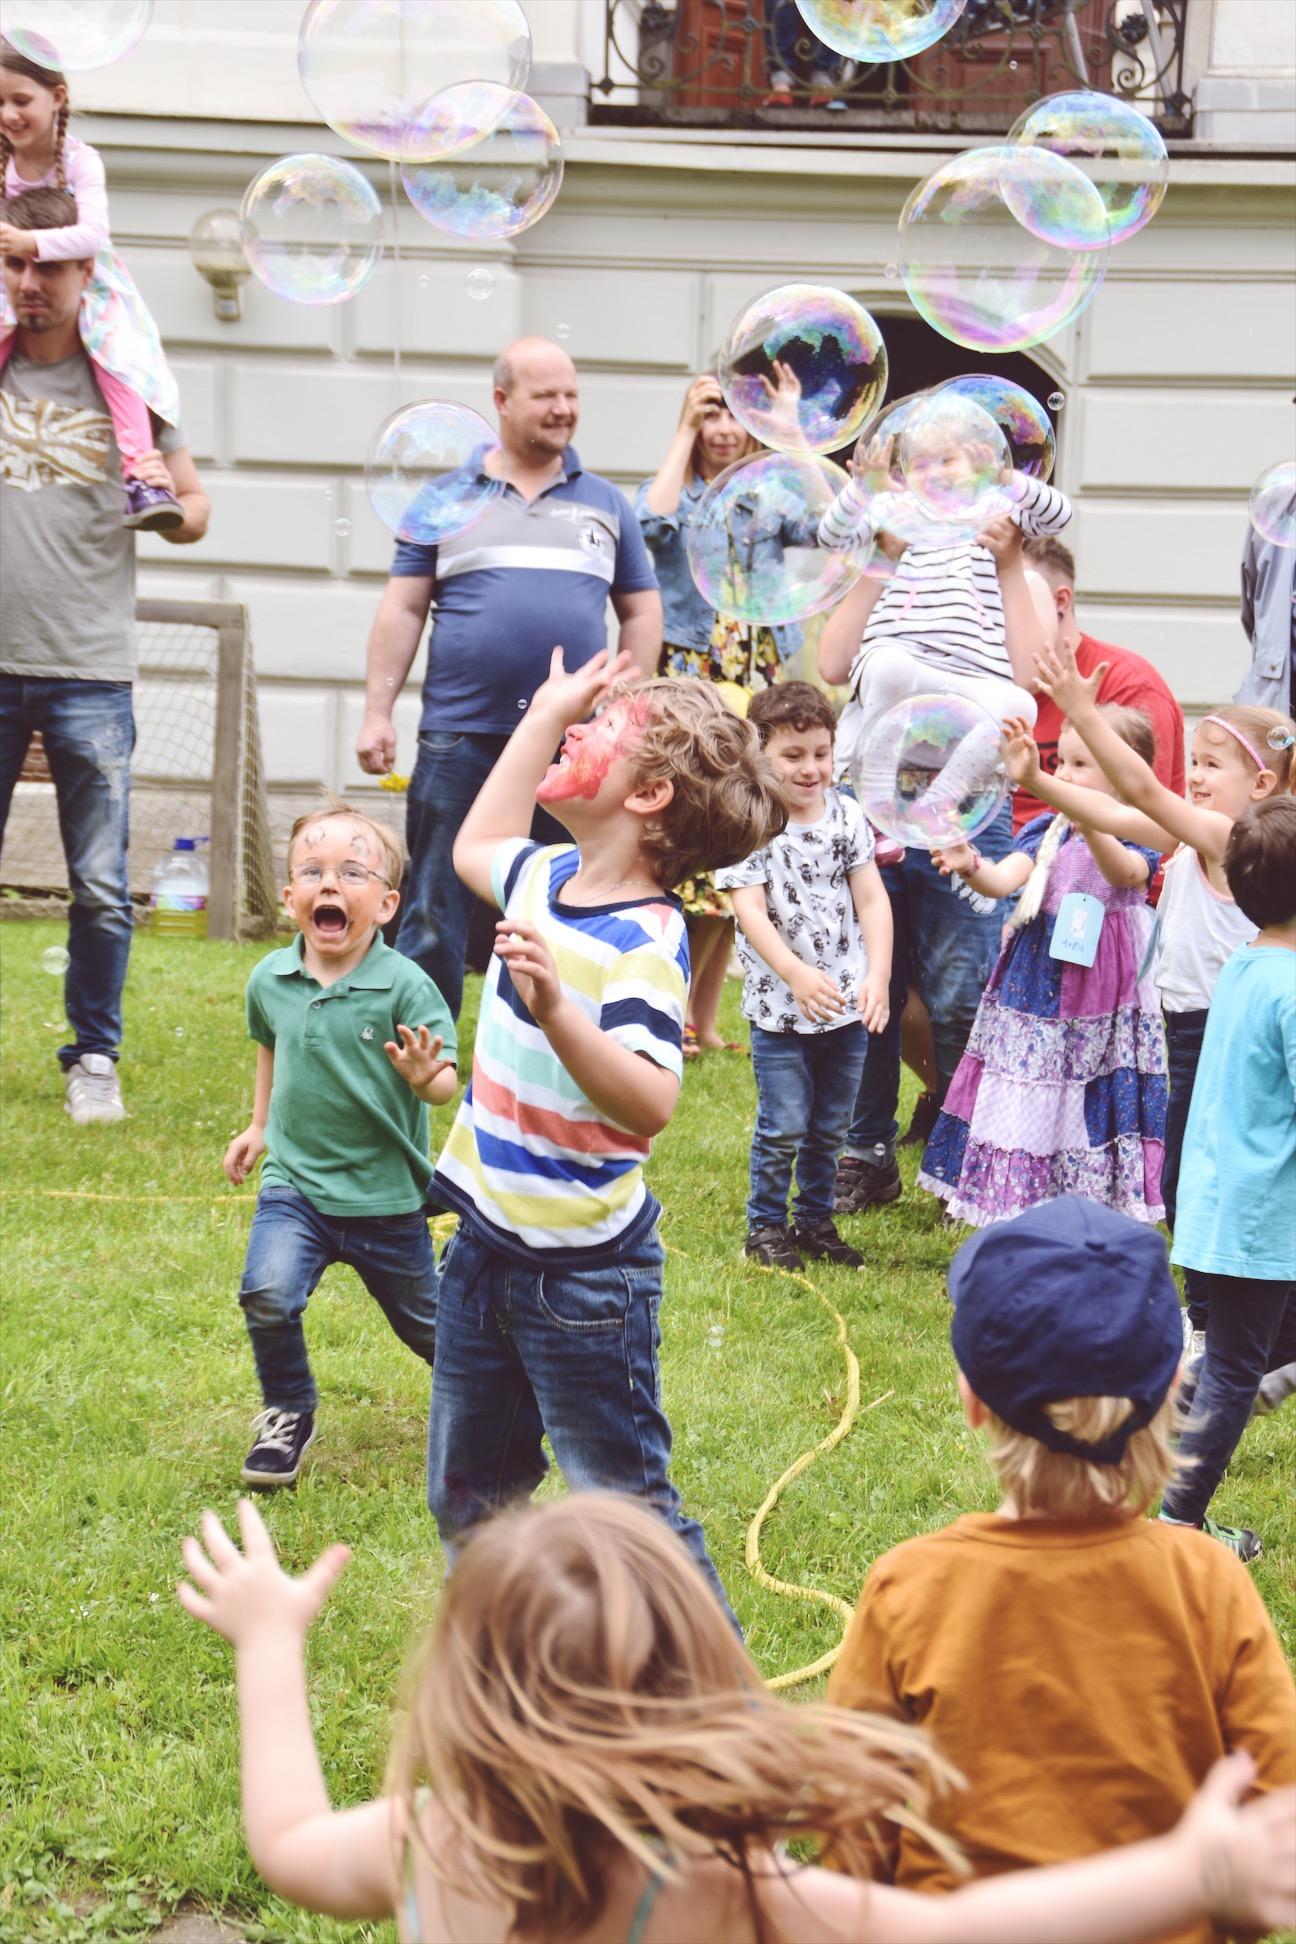 zaubervilla-familienfest-2018-13.JPG